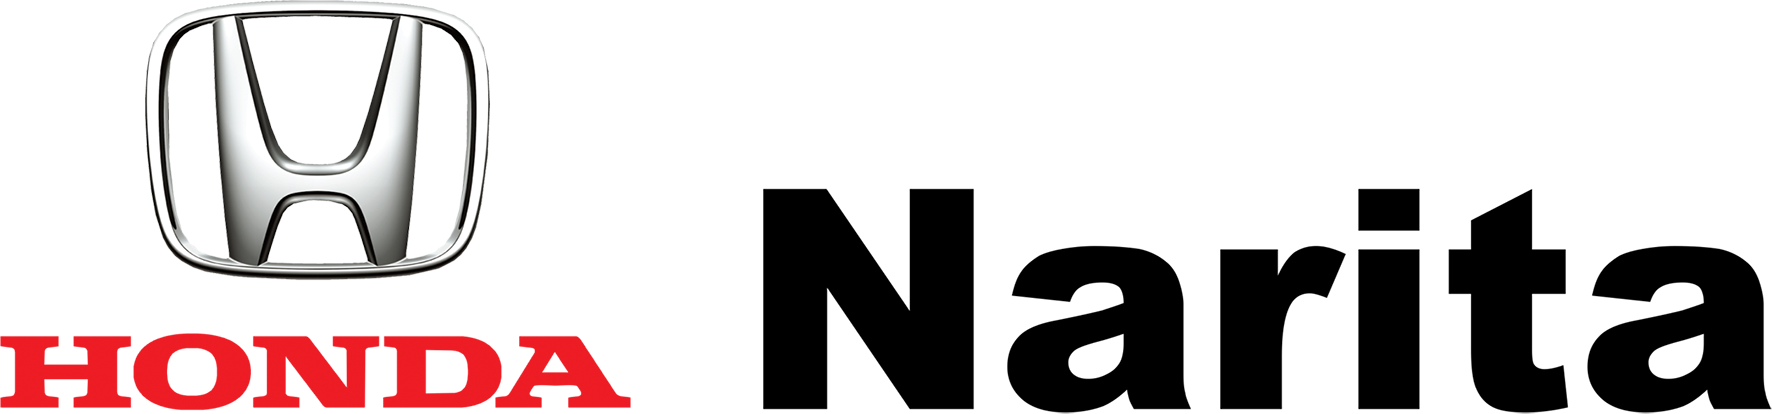 logo-honda-narita-rj